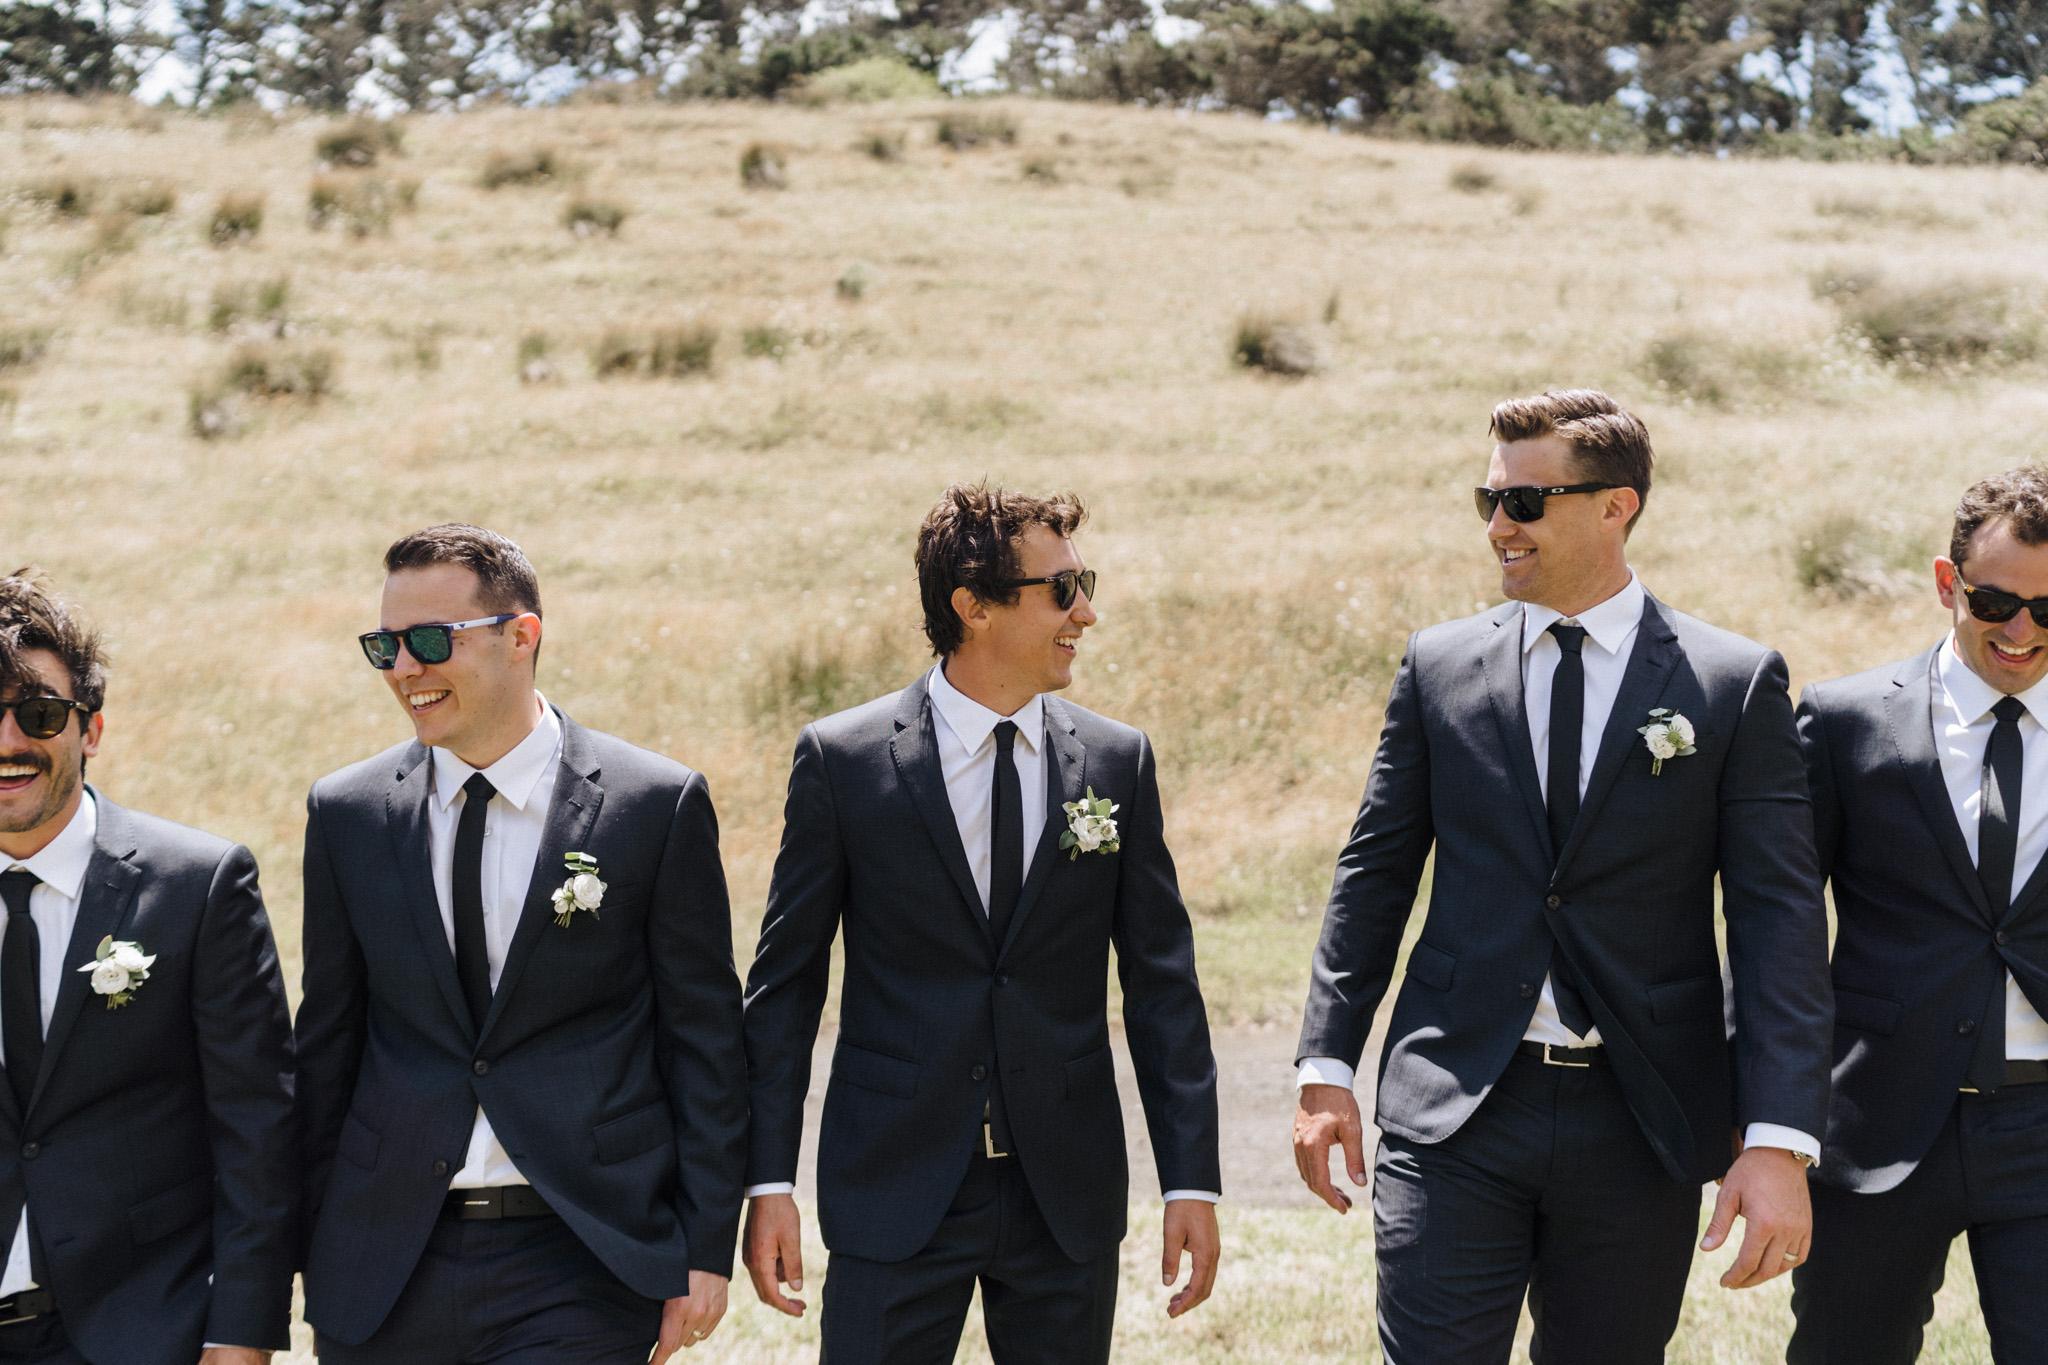 newfound-h-m-castaways-waiuku-auckland-wedding-photographer-55